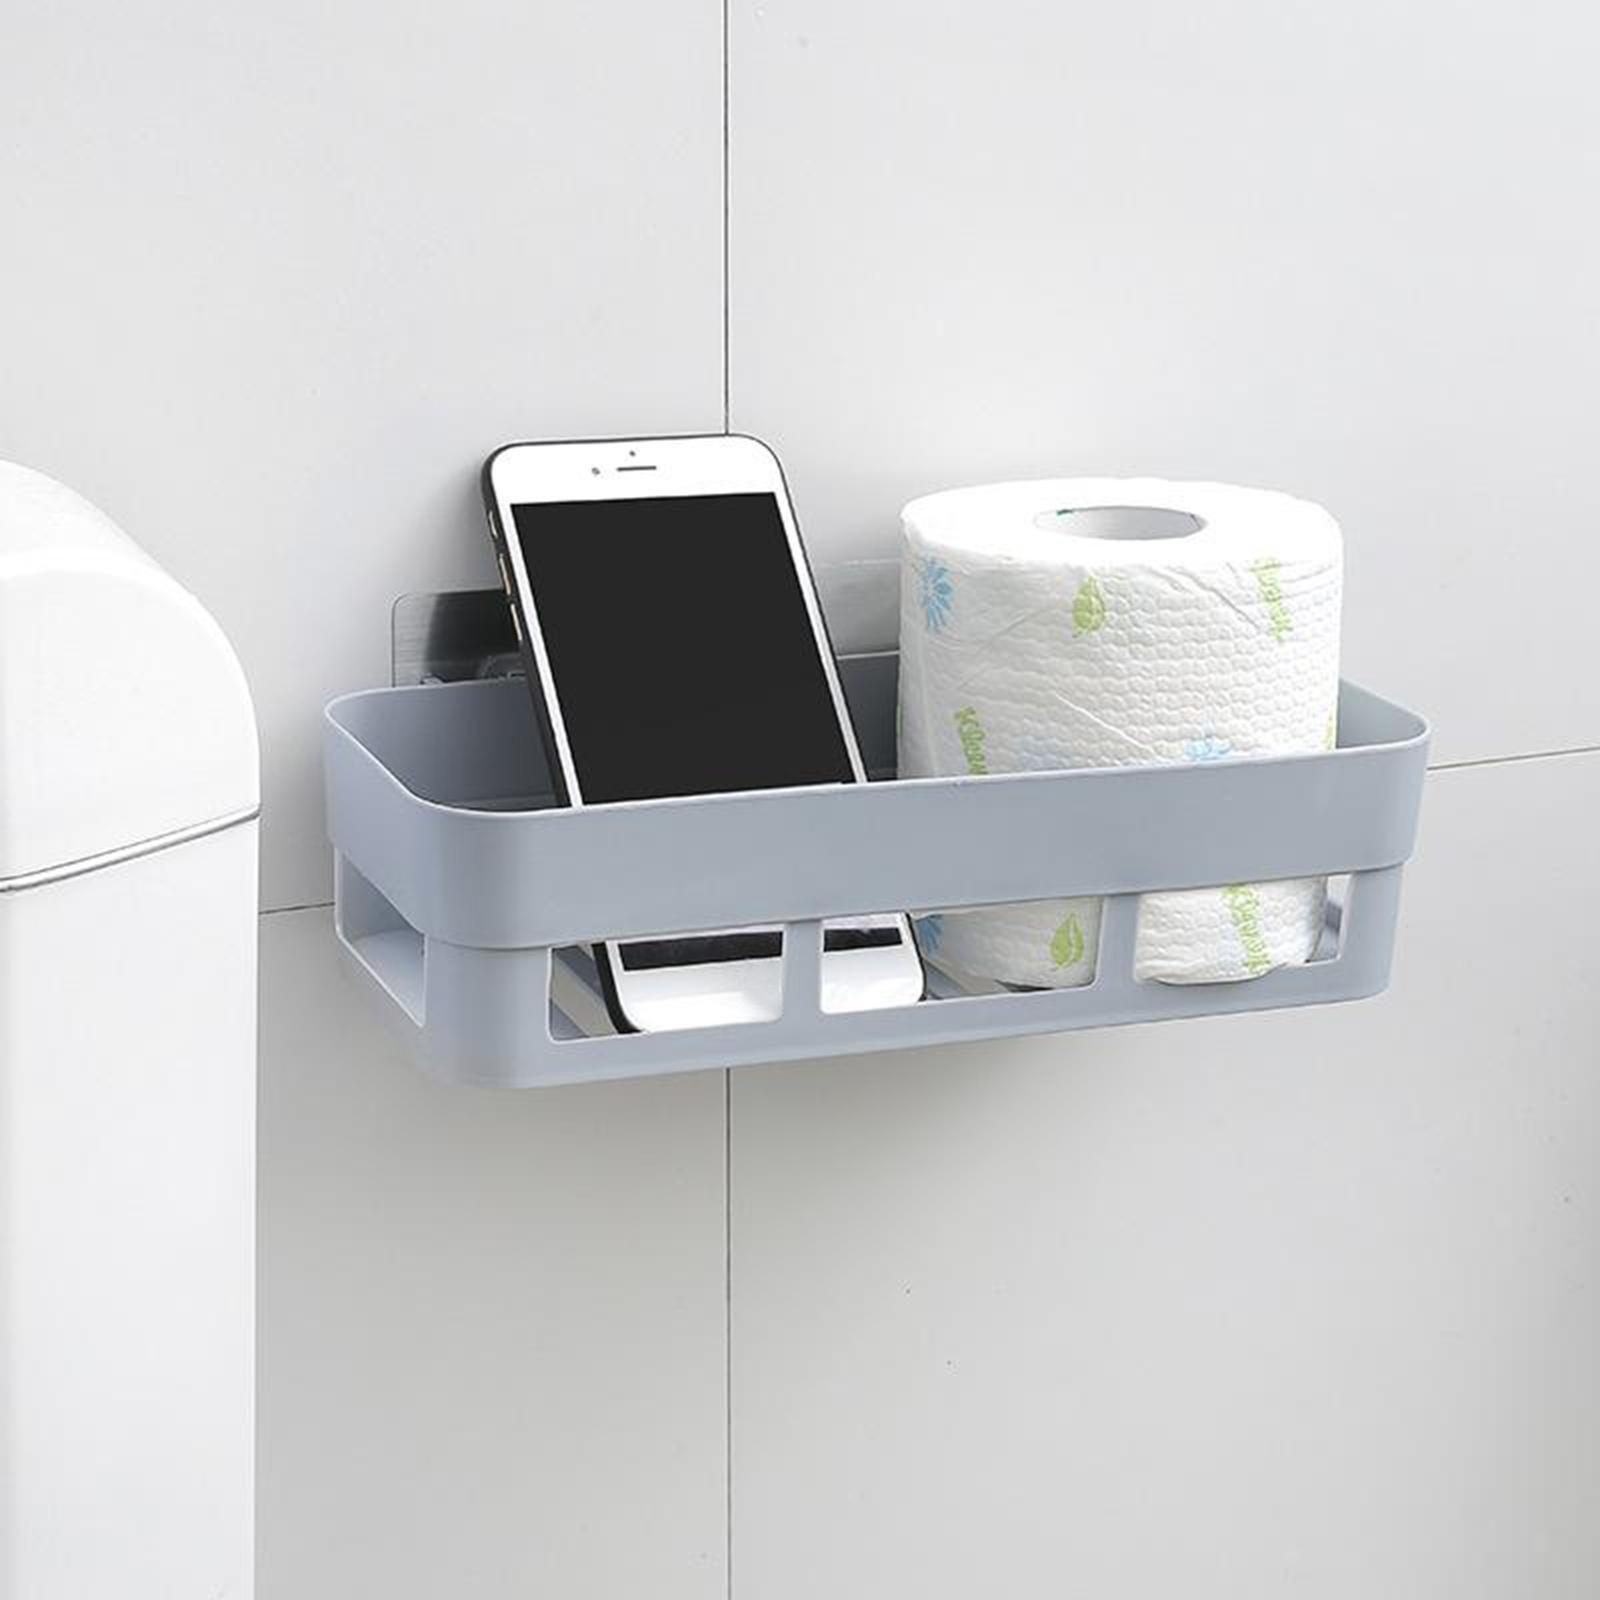 thumbnail 27 - Wall-Suction-Bathroom-Shelf-Shower-Caddy-Wall-Mount-Storage-Rack-Organizer